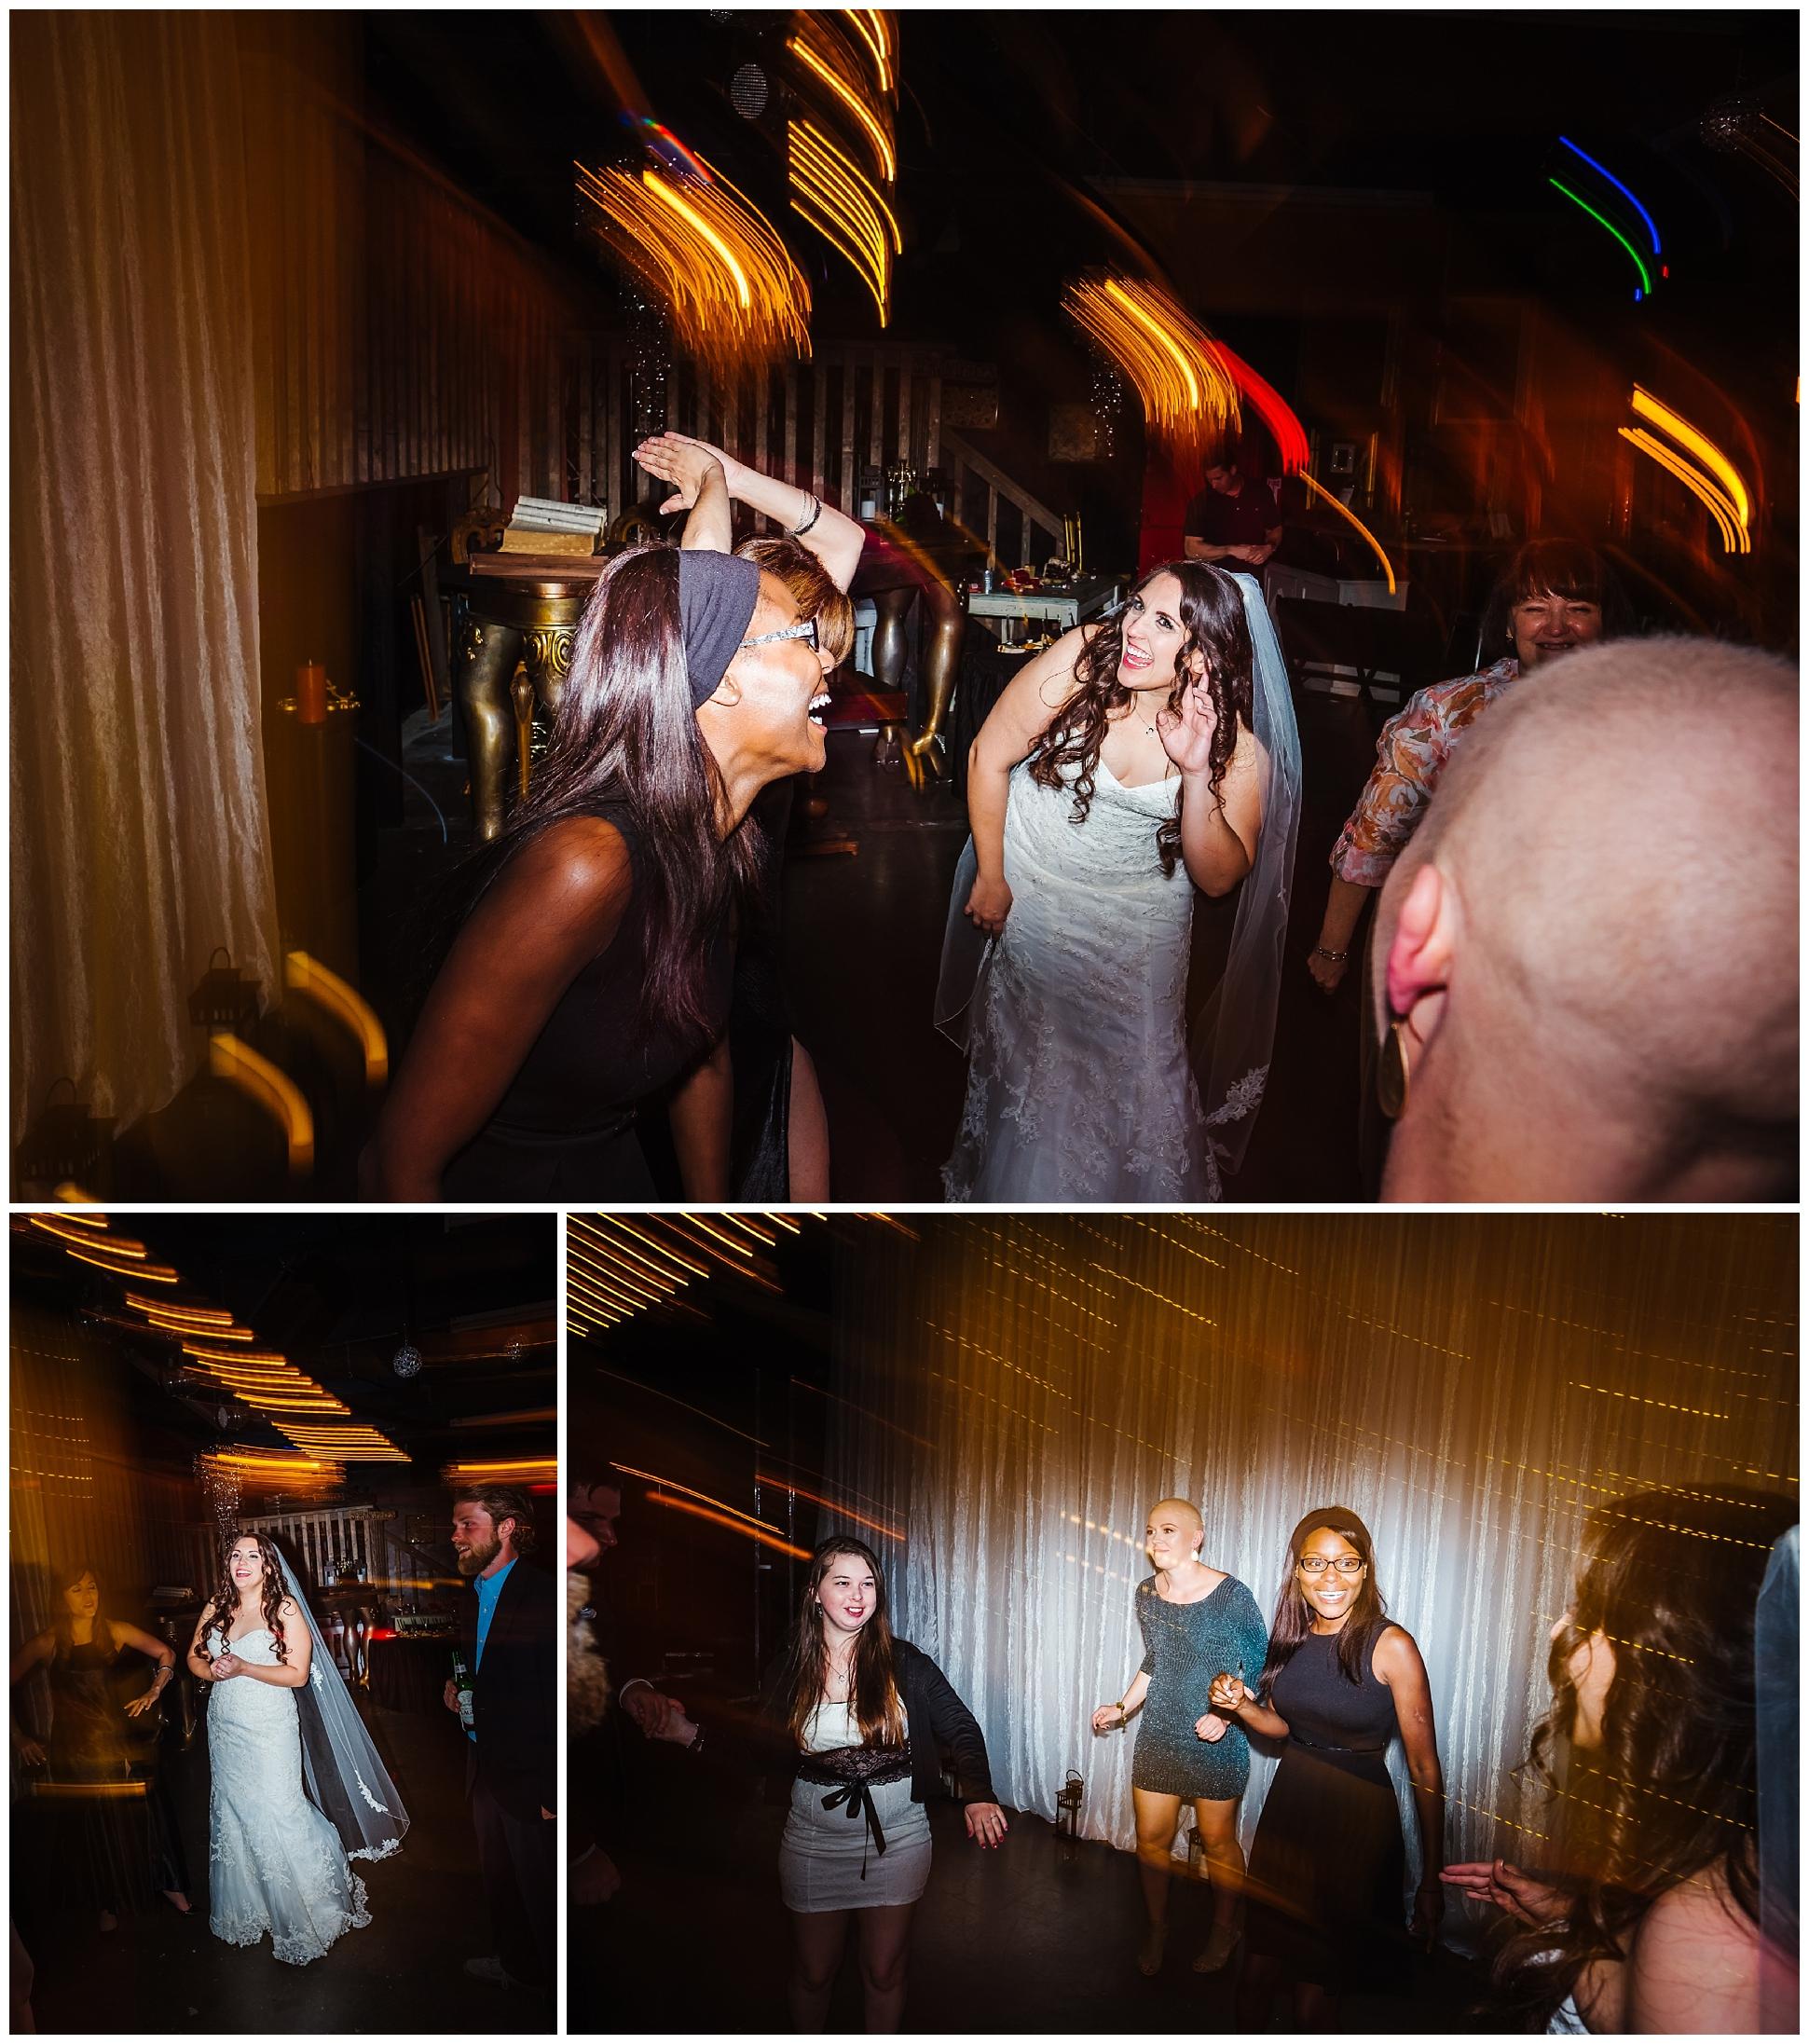 tampa-wedding-photographer-unique-indoor-venue_0049.jpg